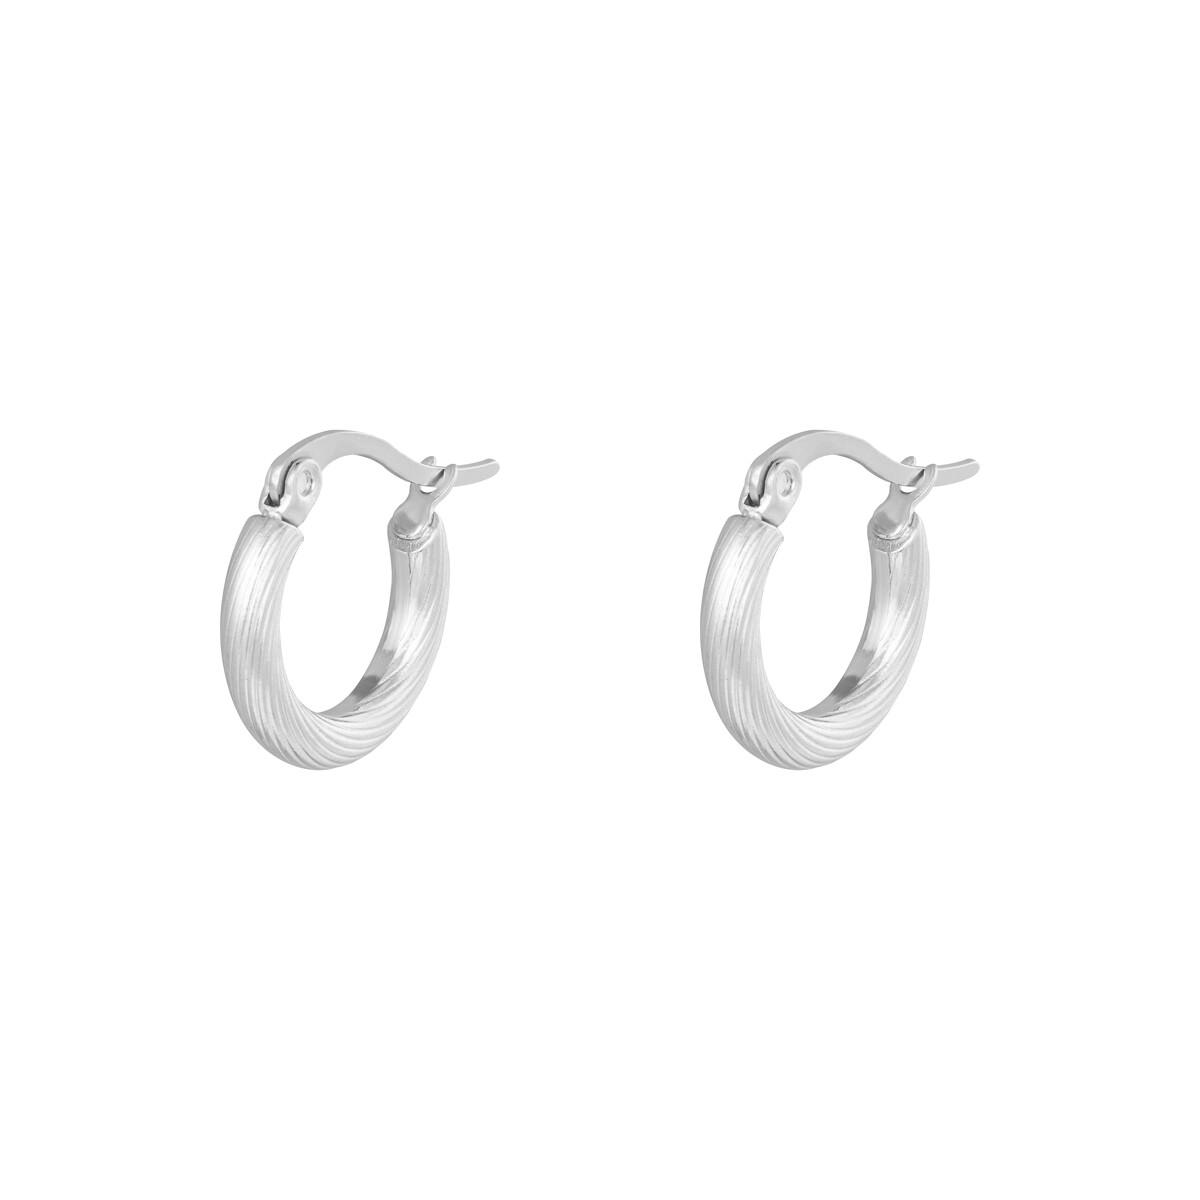 Twist oorringetjes zilver 15mm stainless steel